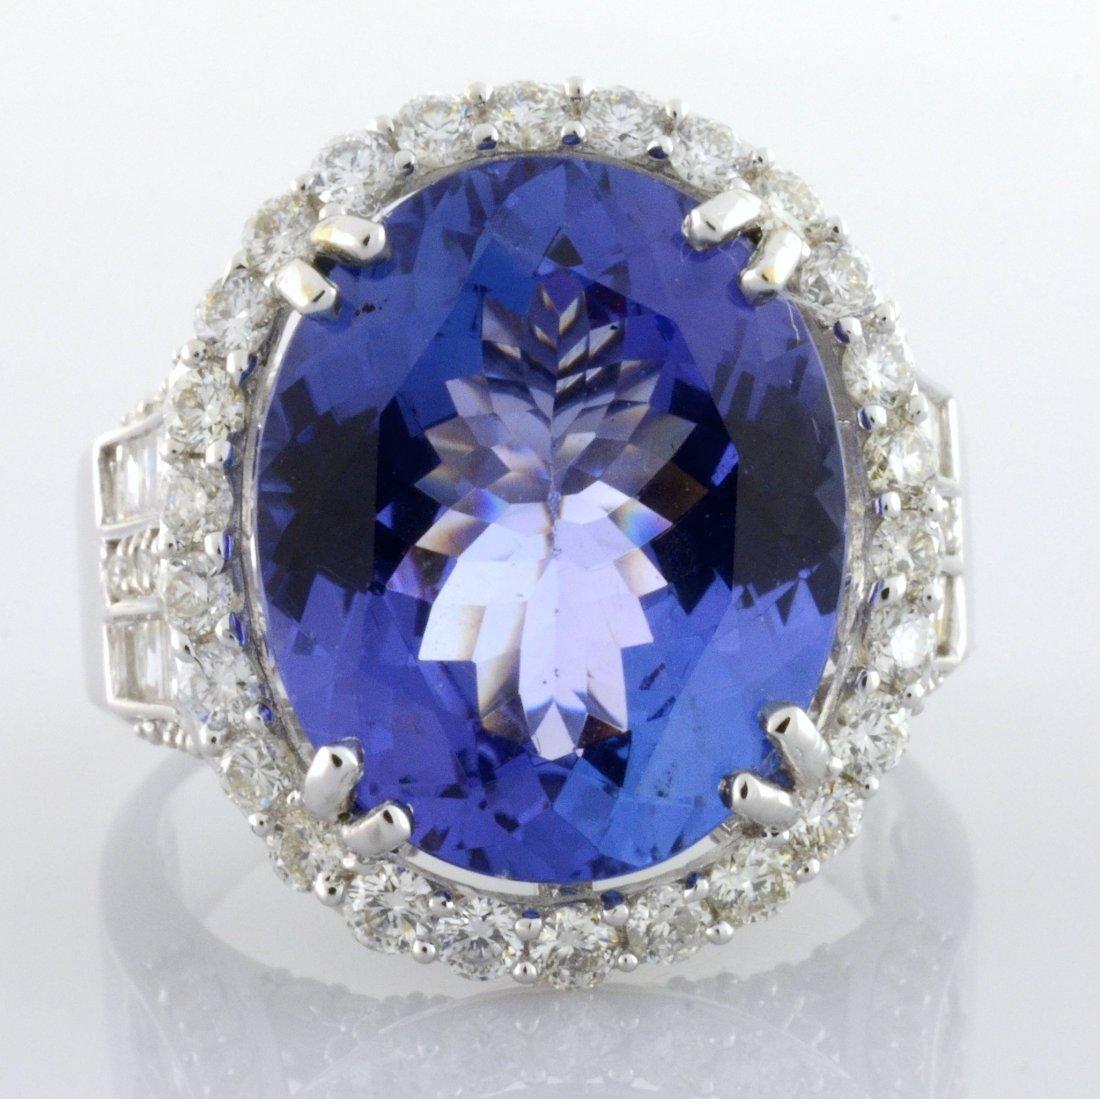 Tanzanite & Diamond Ring Appraised Value: $20,900